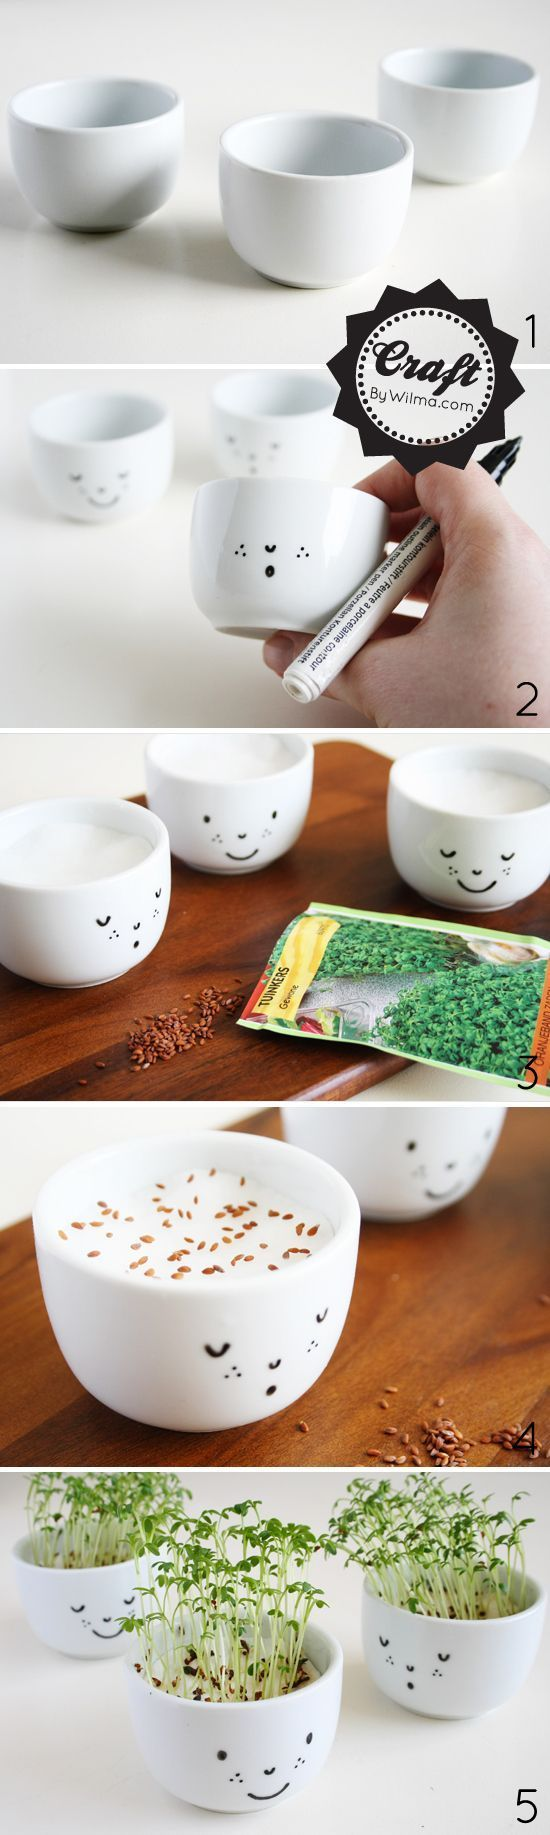 Kressetöpfe - süße Idee für daheim mit Kindern